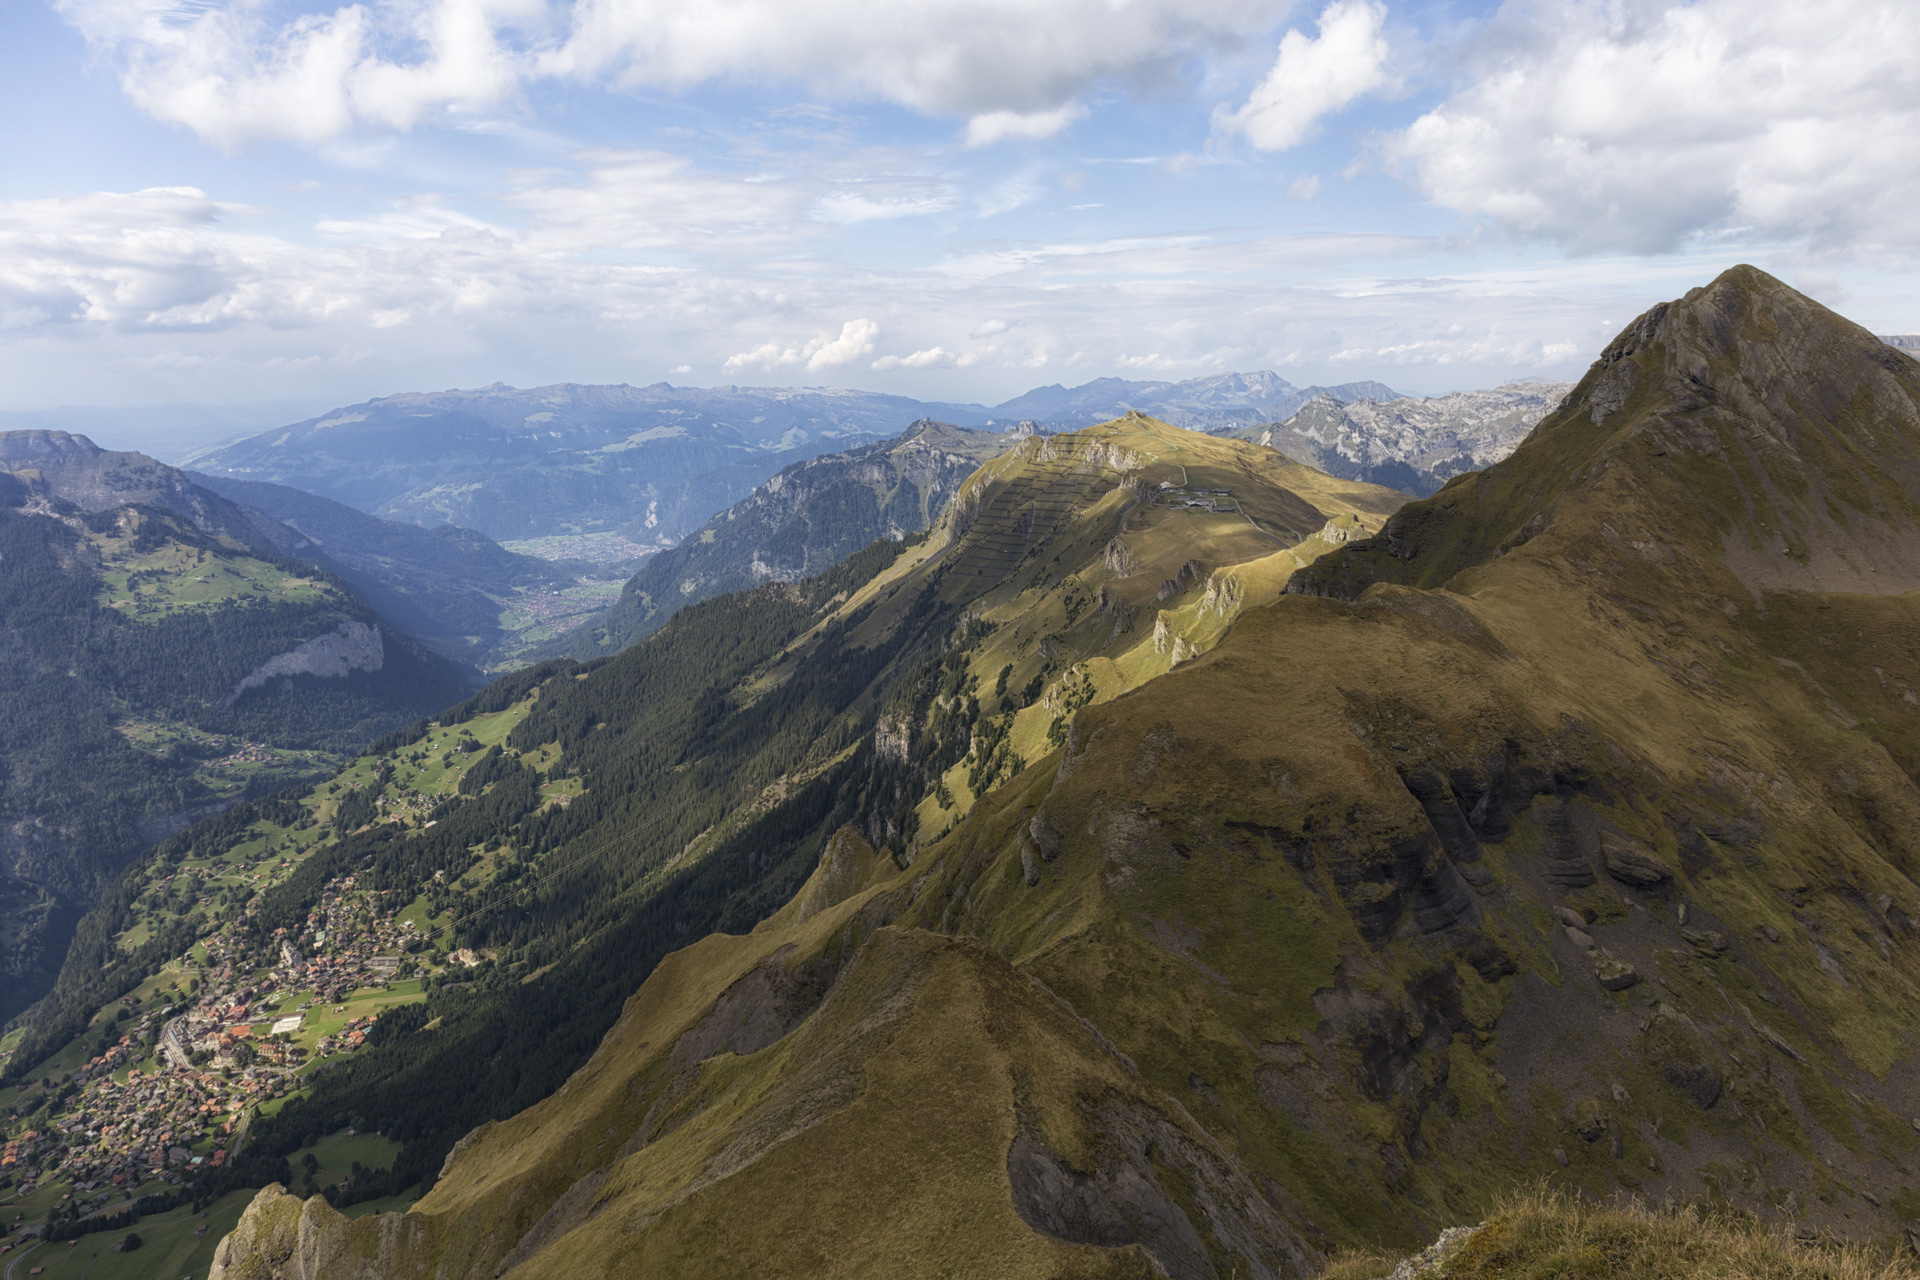 Berner-Oberland_20150911_1763-2